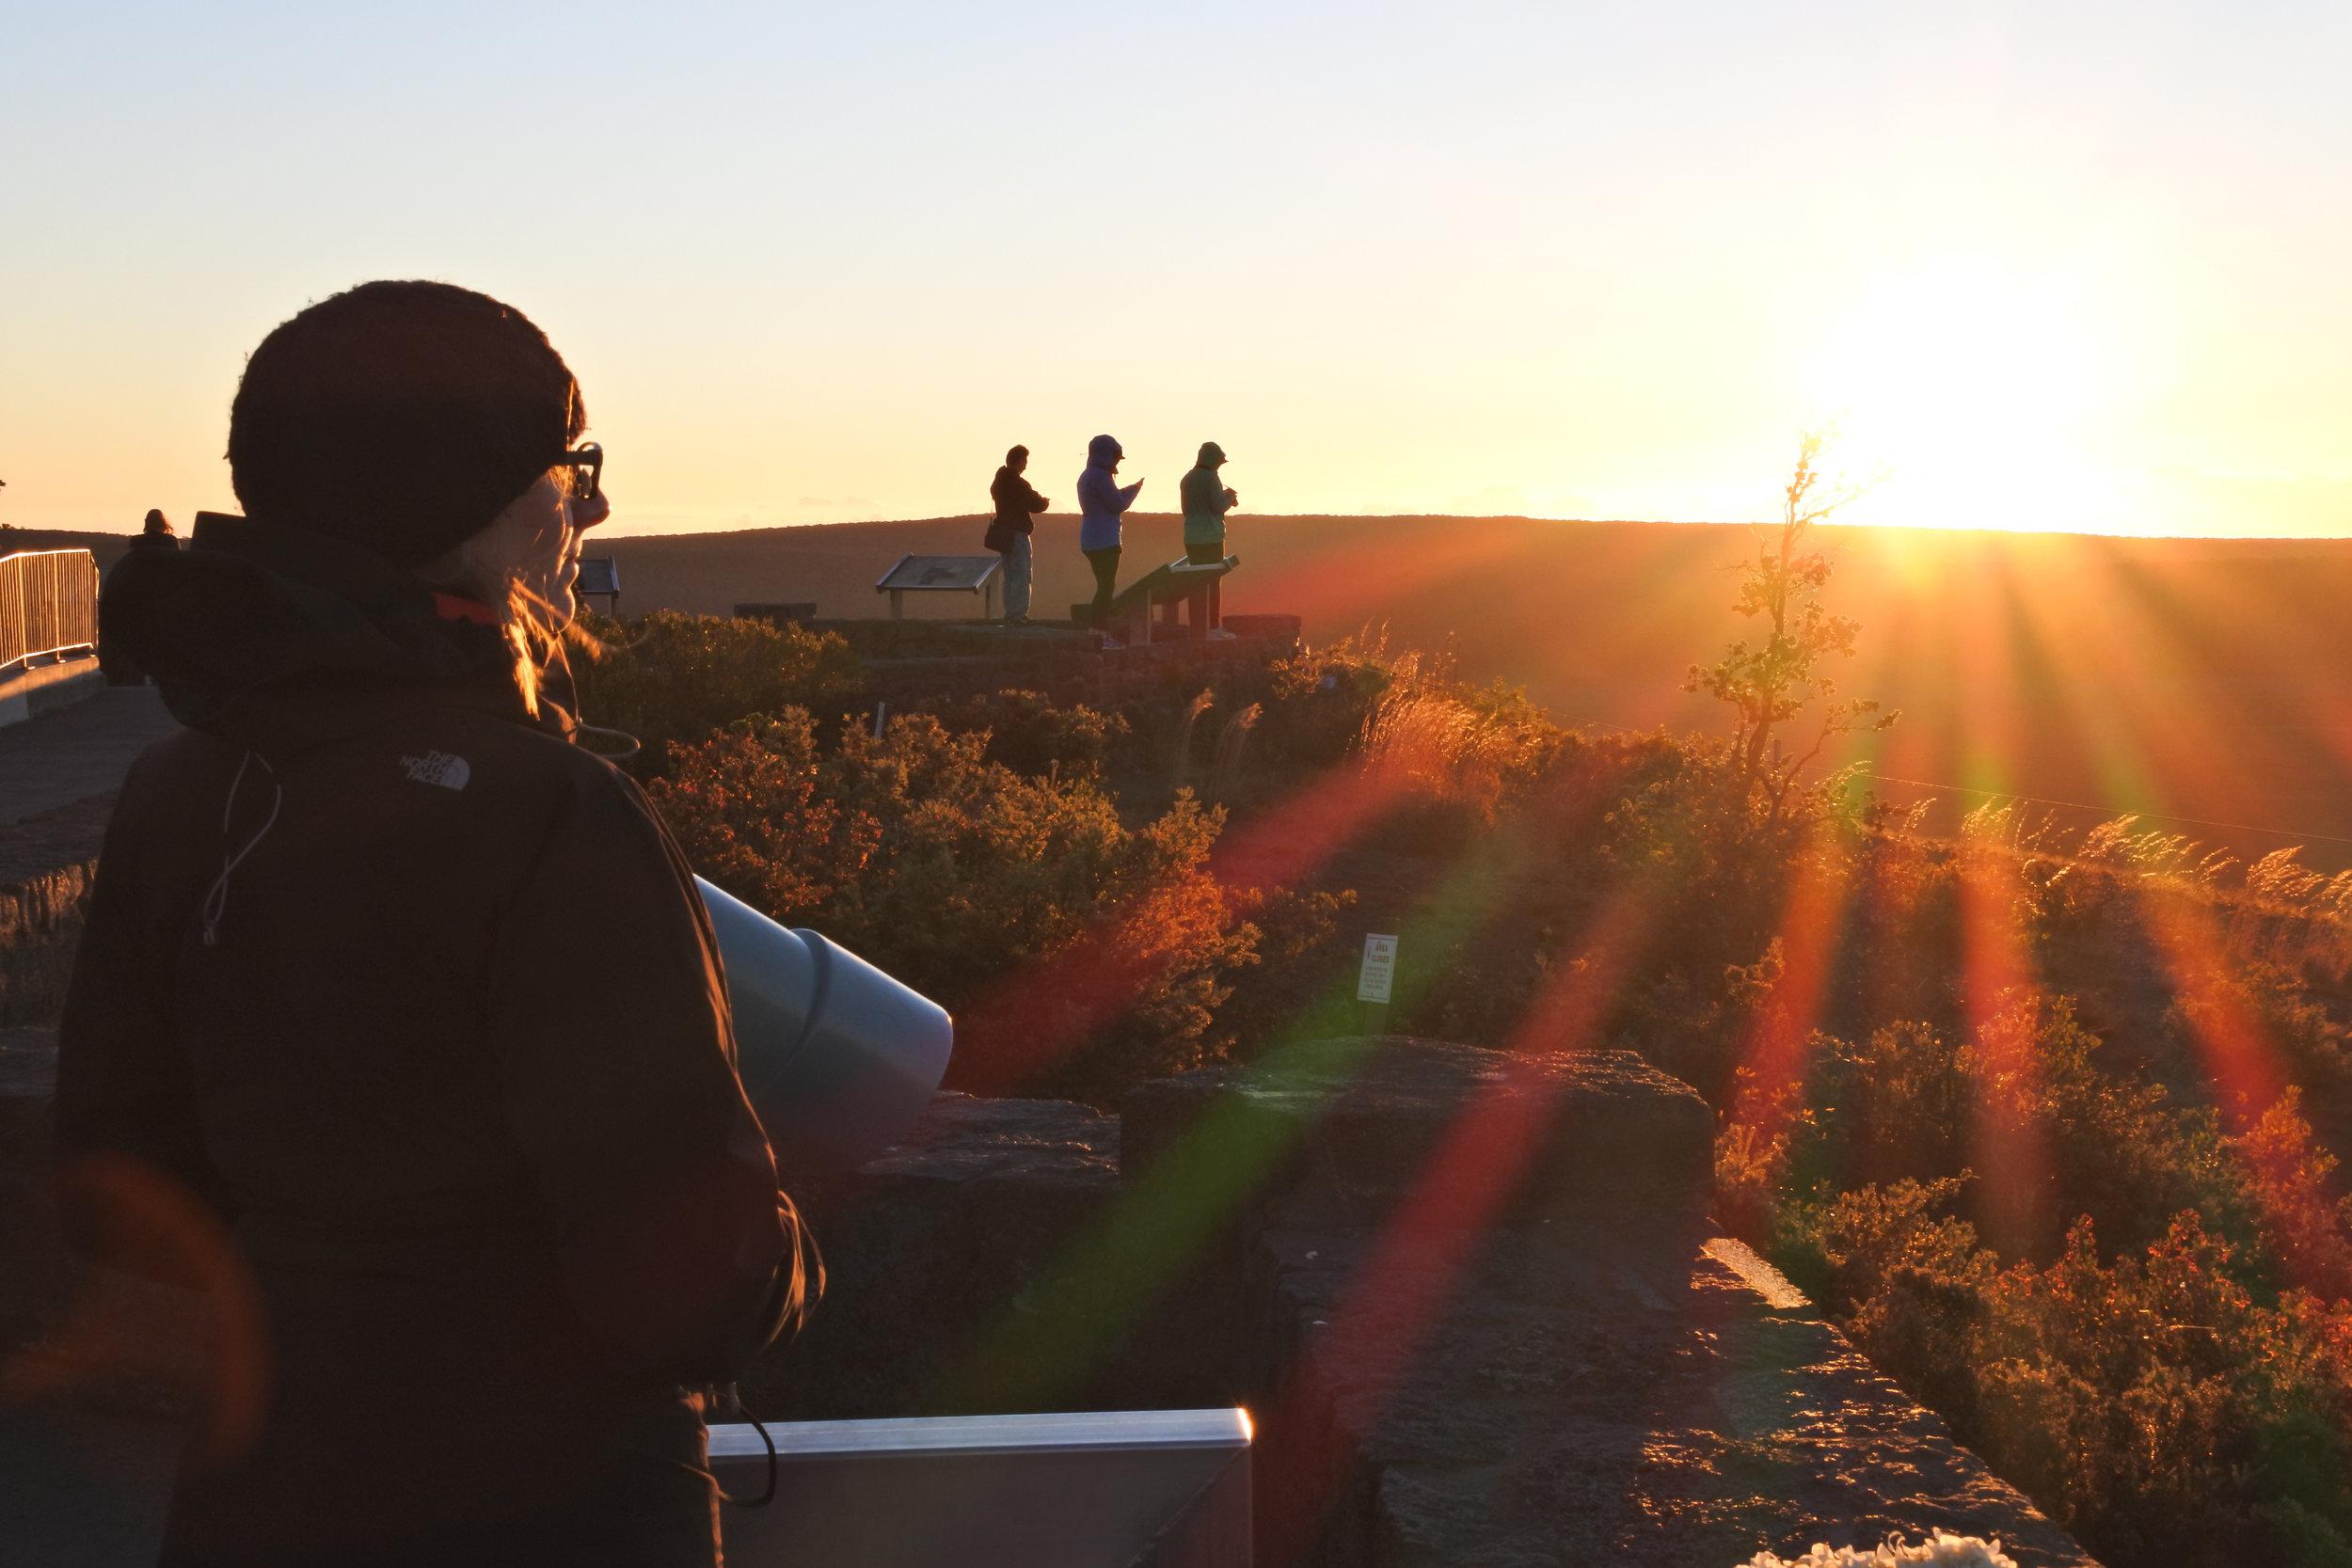 Kilauea at sunrise with good friends